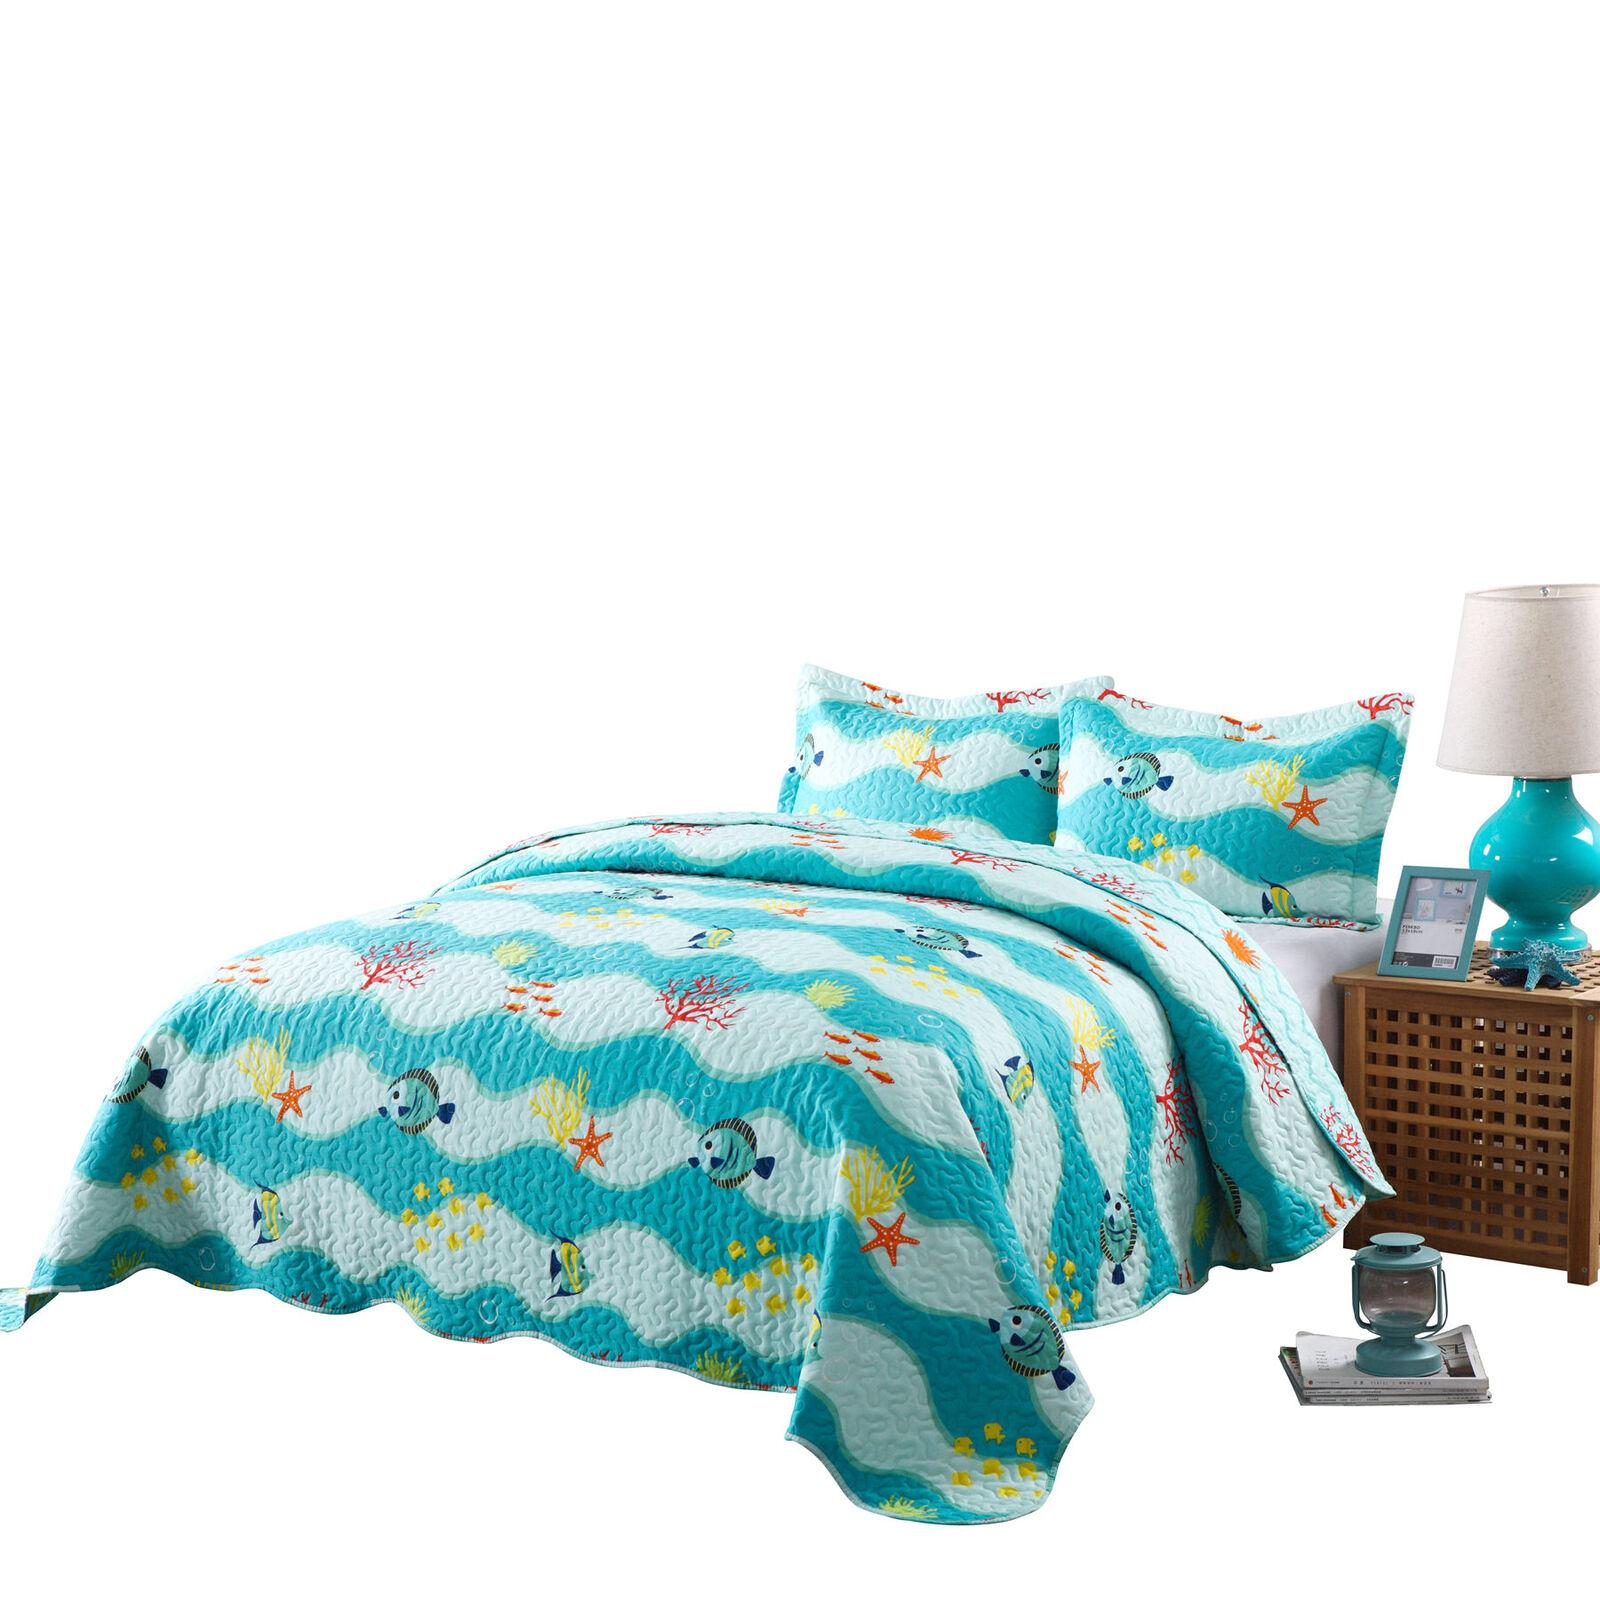 2 Pcs Kids Quilt Set Throw Blanket For Teens Boys Girls Bedd